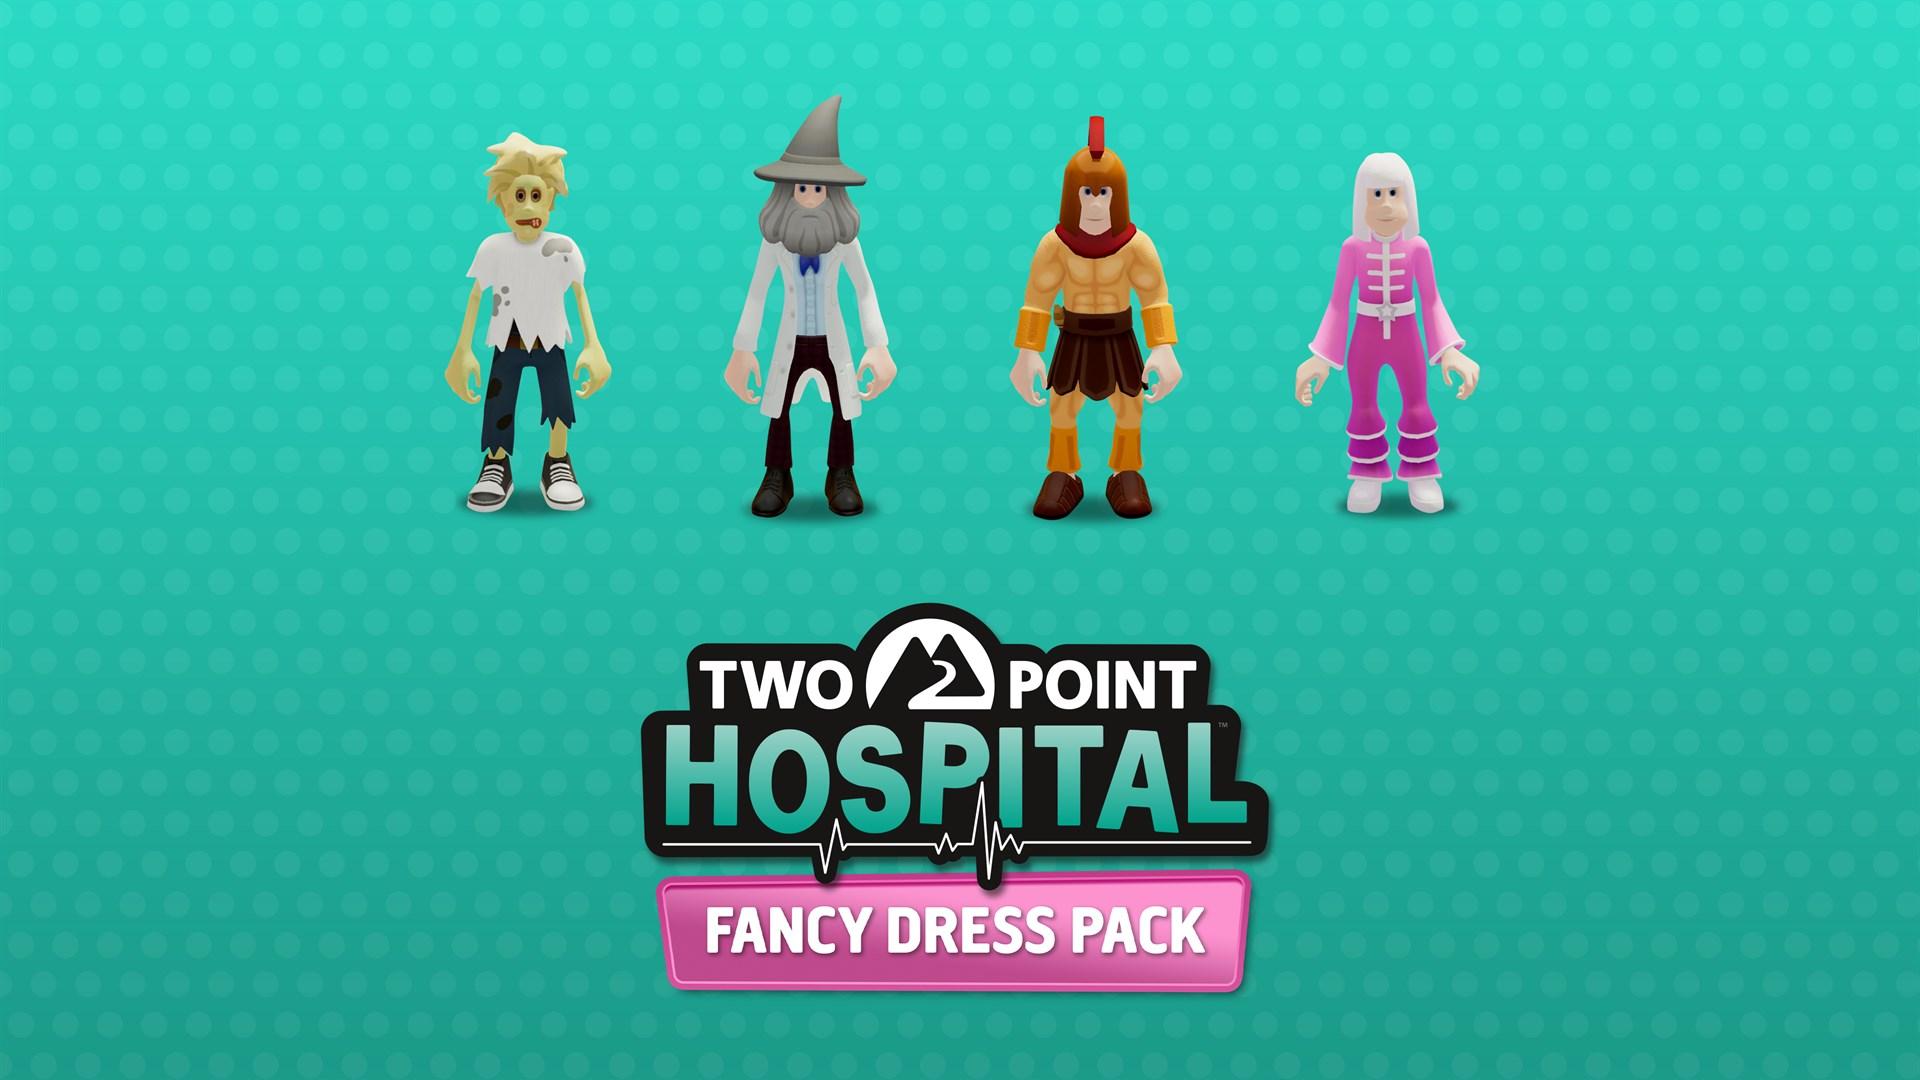 Two Point Hospital: Fancy Dress Pack